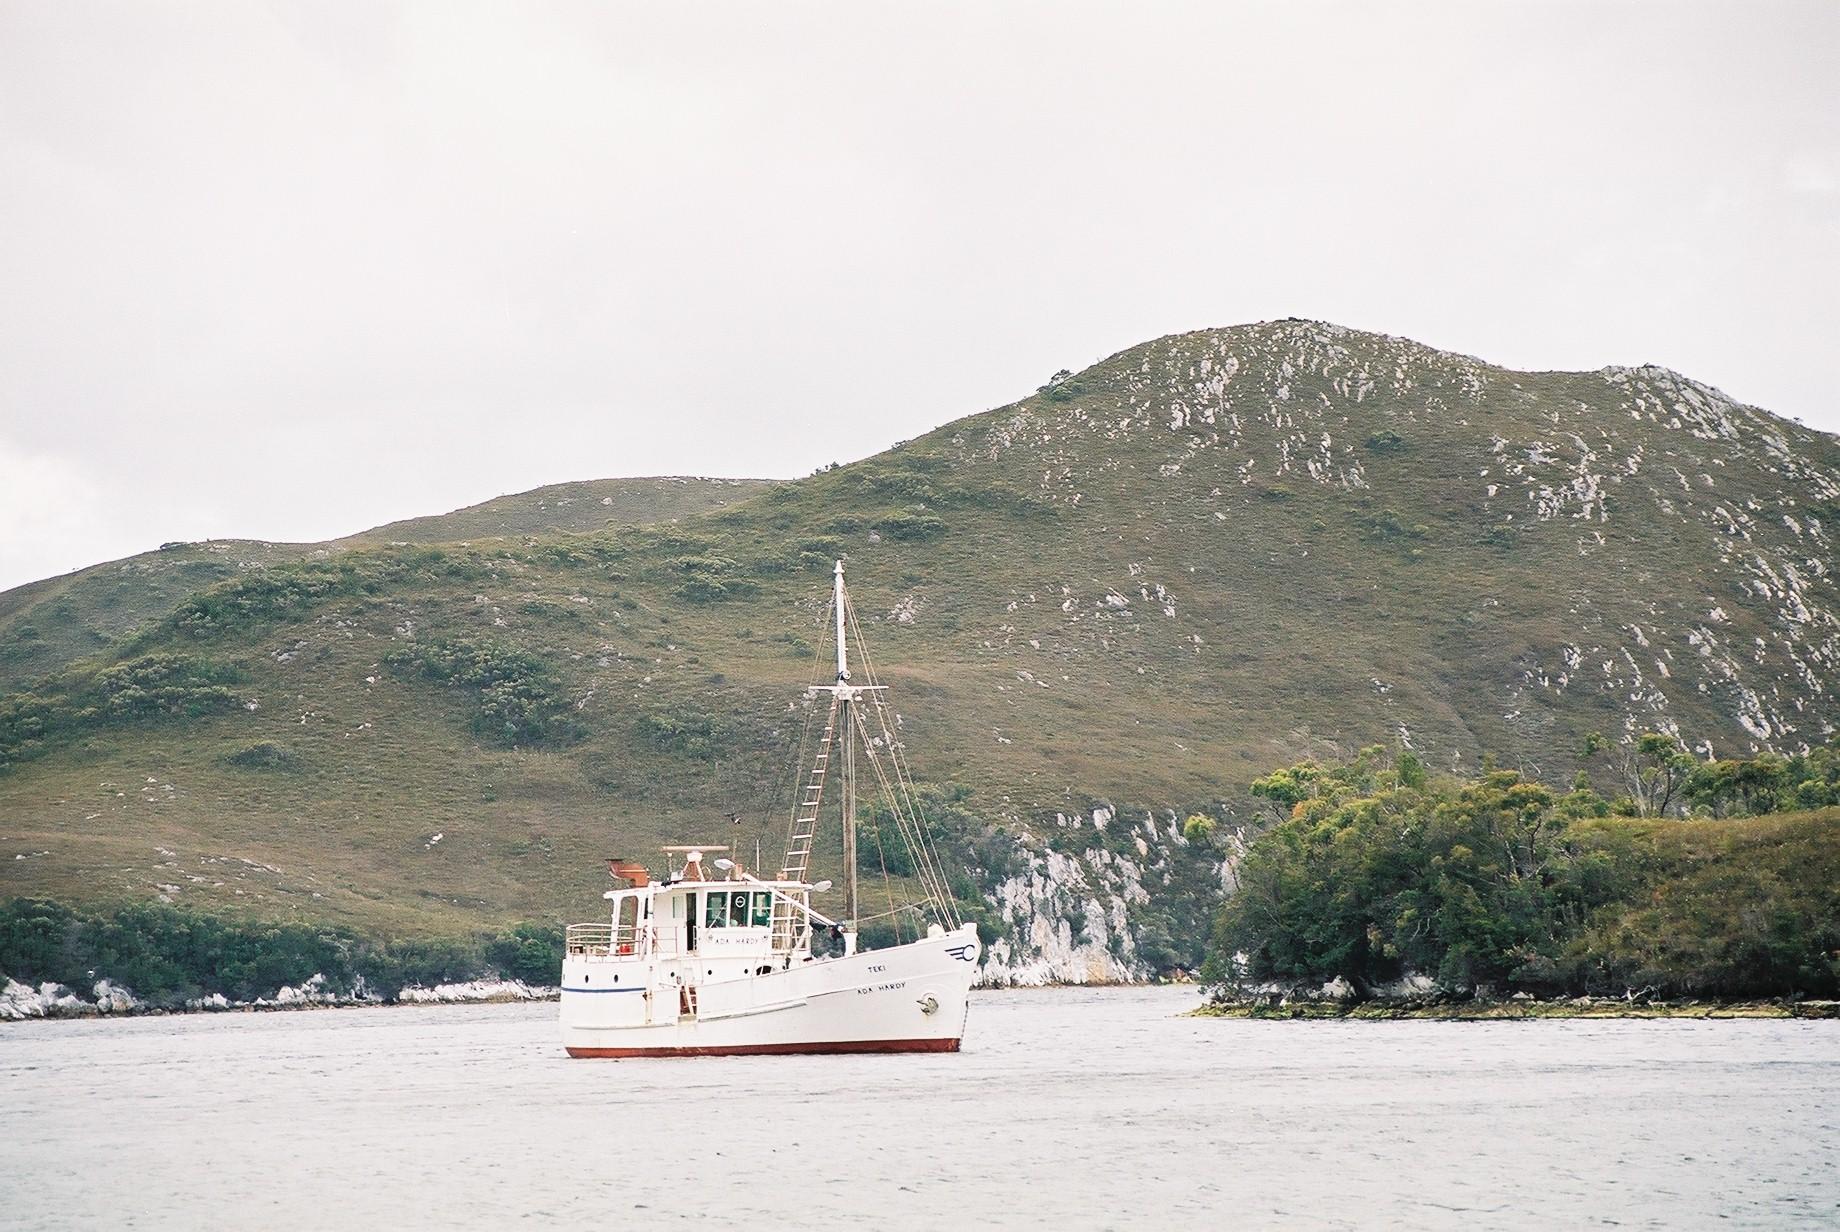 Anchored Wombat Cove